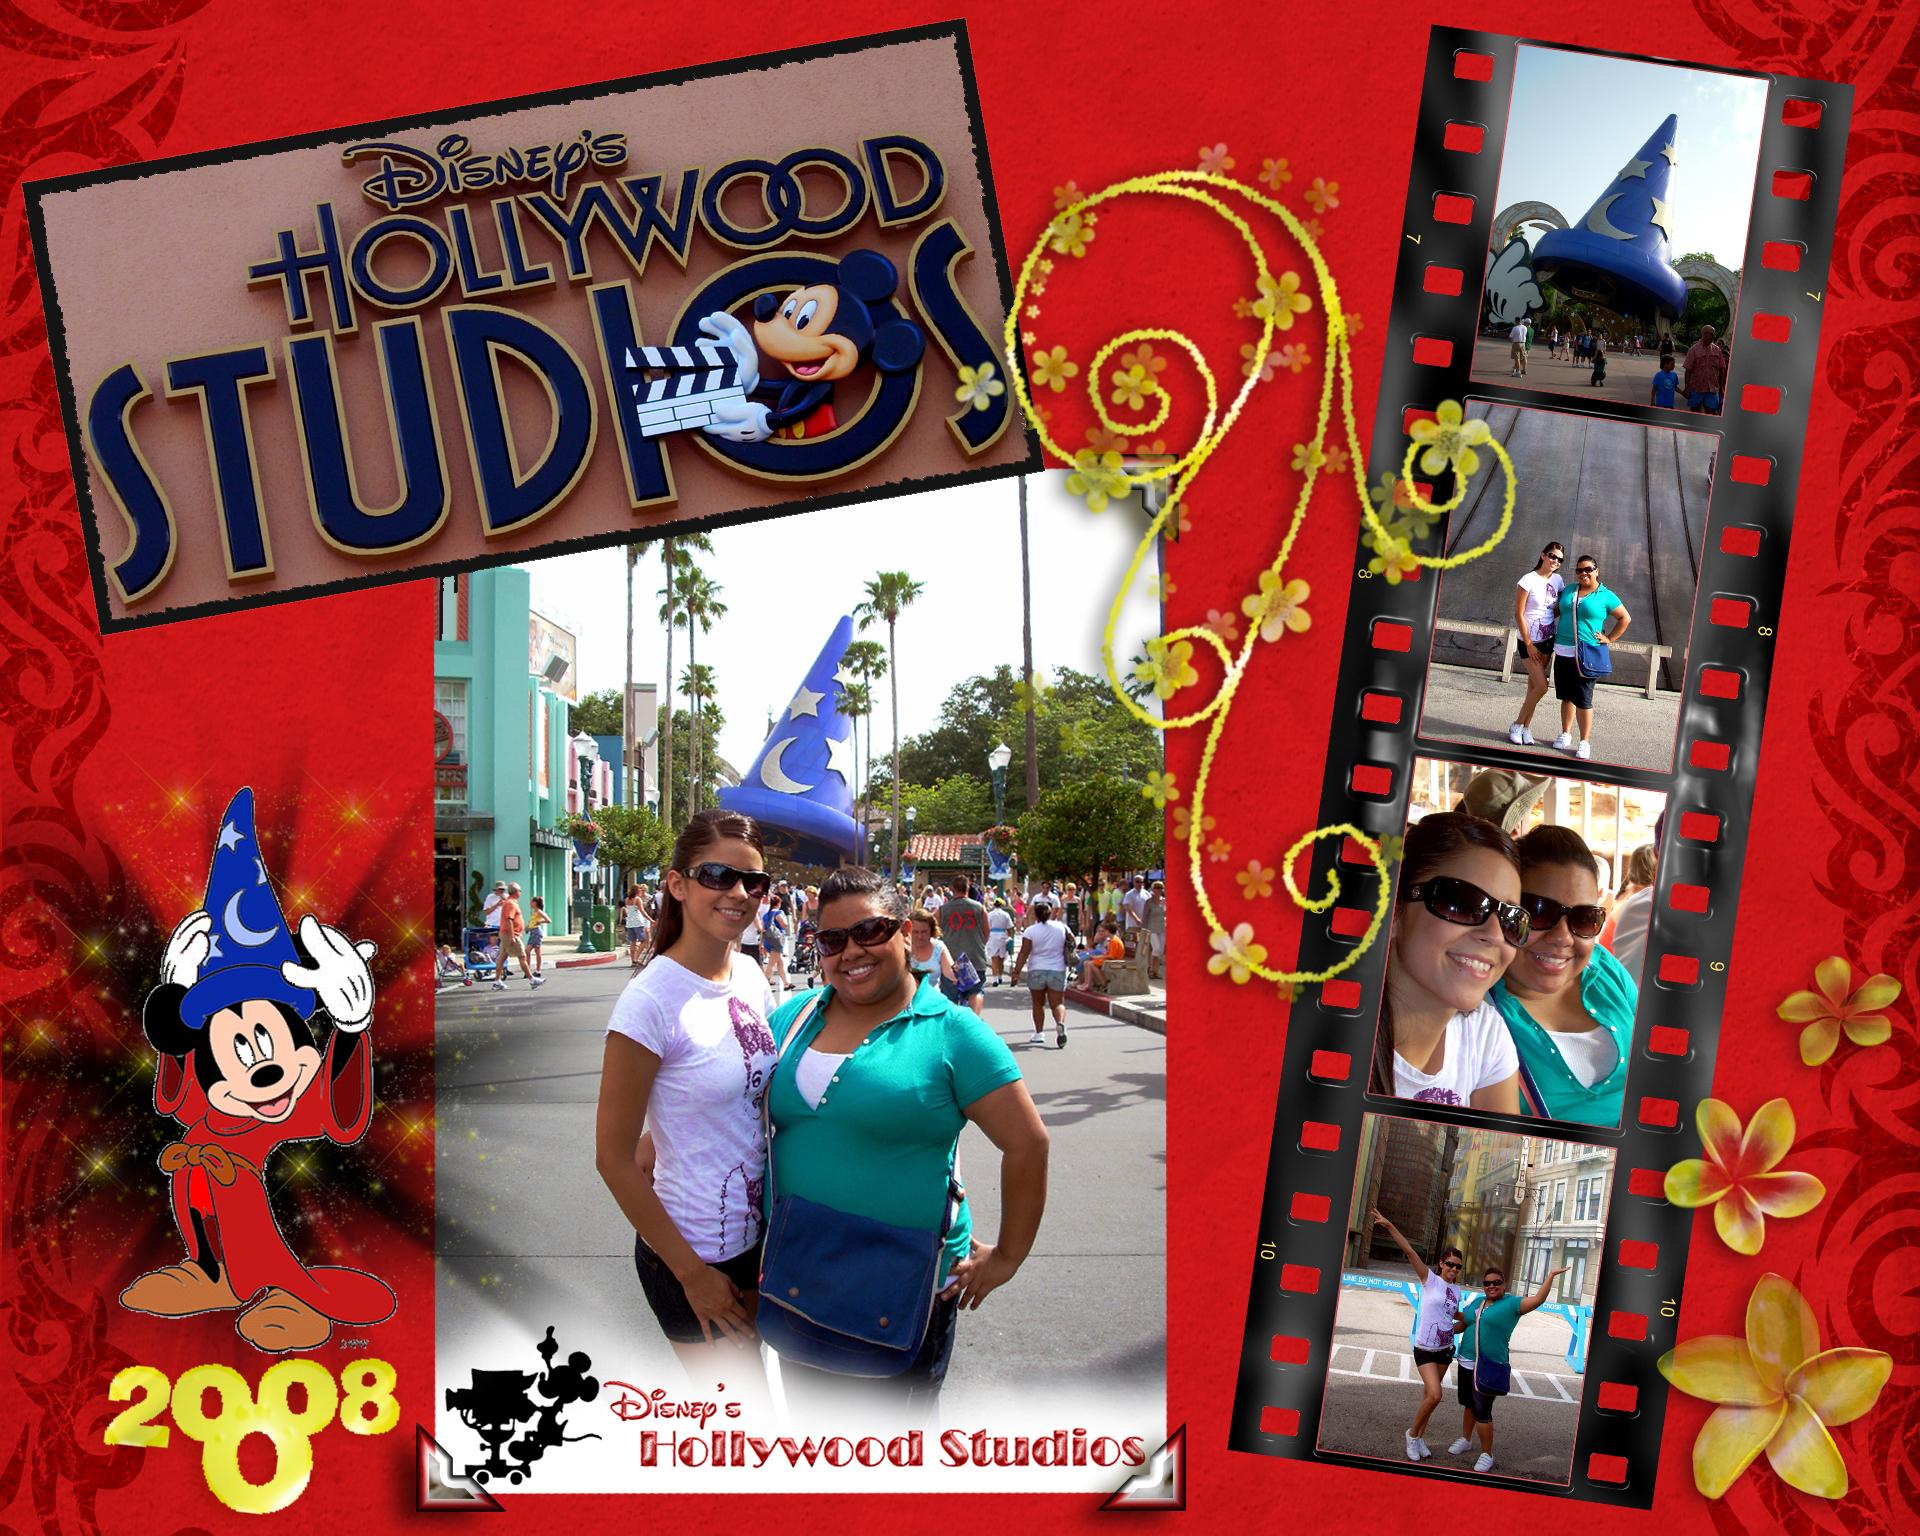 Disney scrapbook ideas -  Ideas For Disney Quotes Scrapbooking World Disney S Studios Digital Hollywood